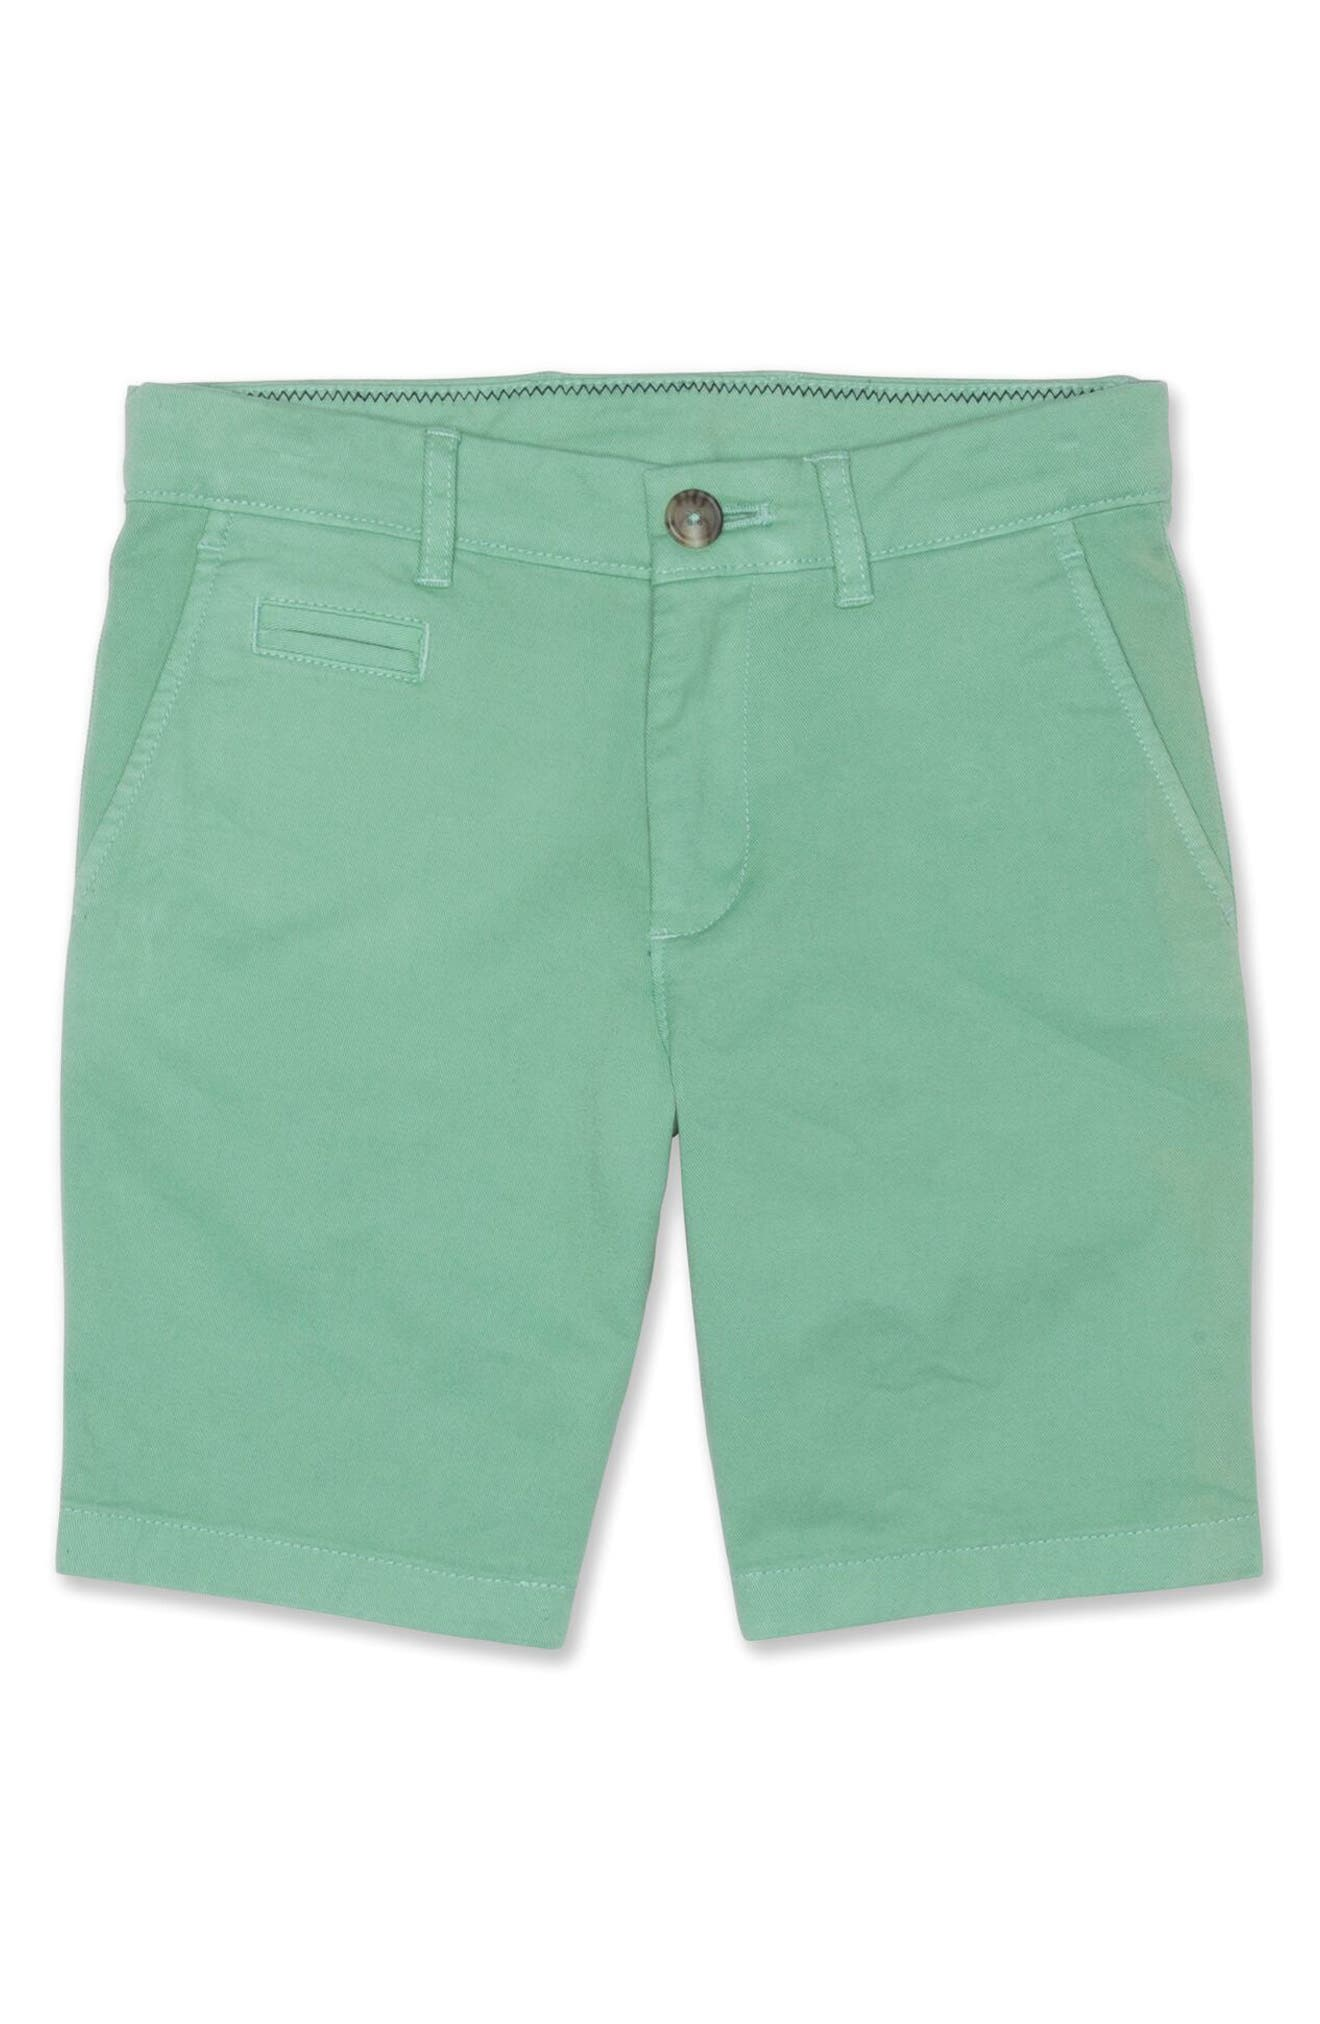 Neal Twill Shorts,                             Main thumbnail 1, color,                             Kiwi